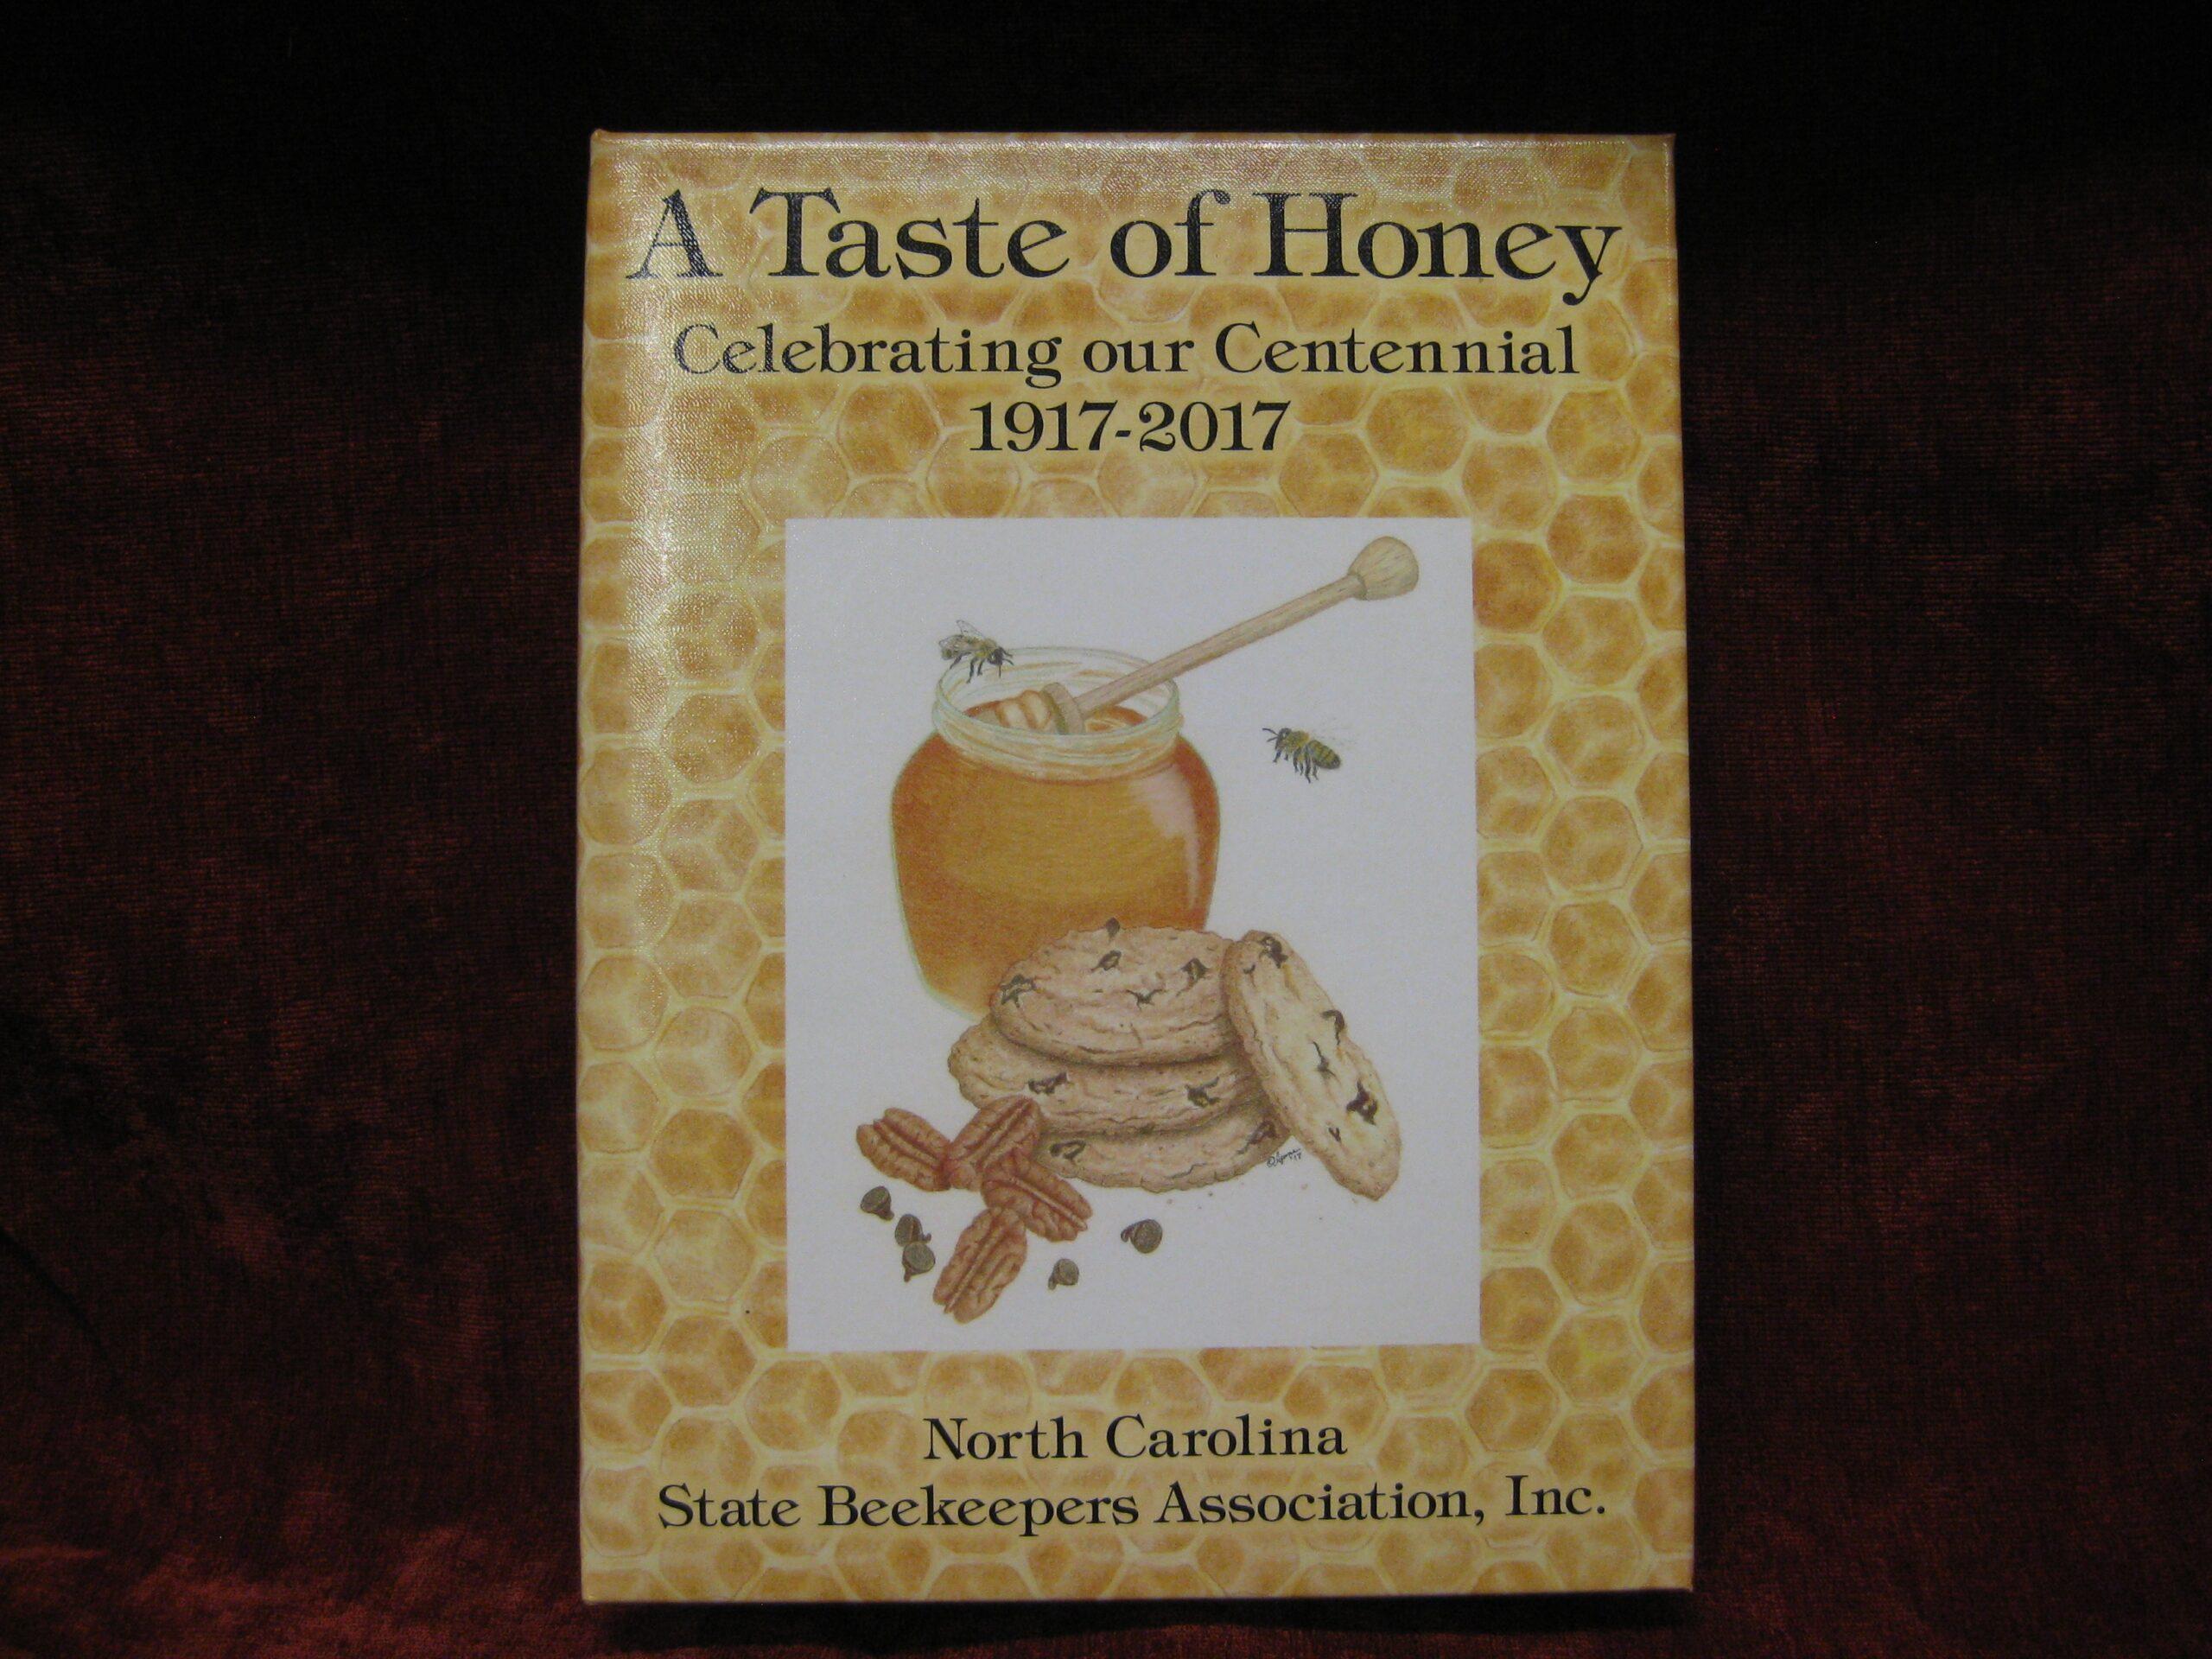 A Taste of Honey Cookbook